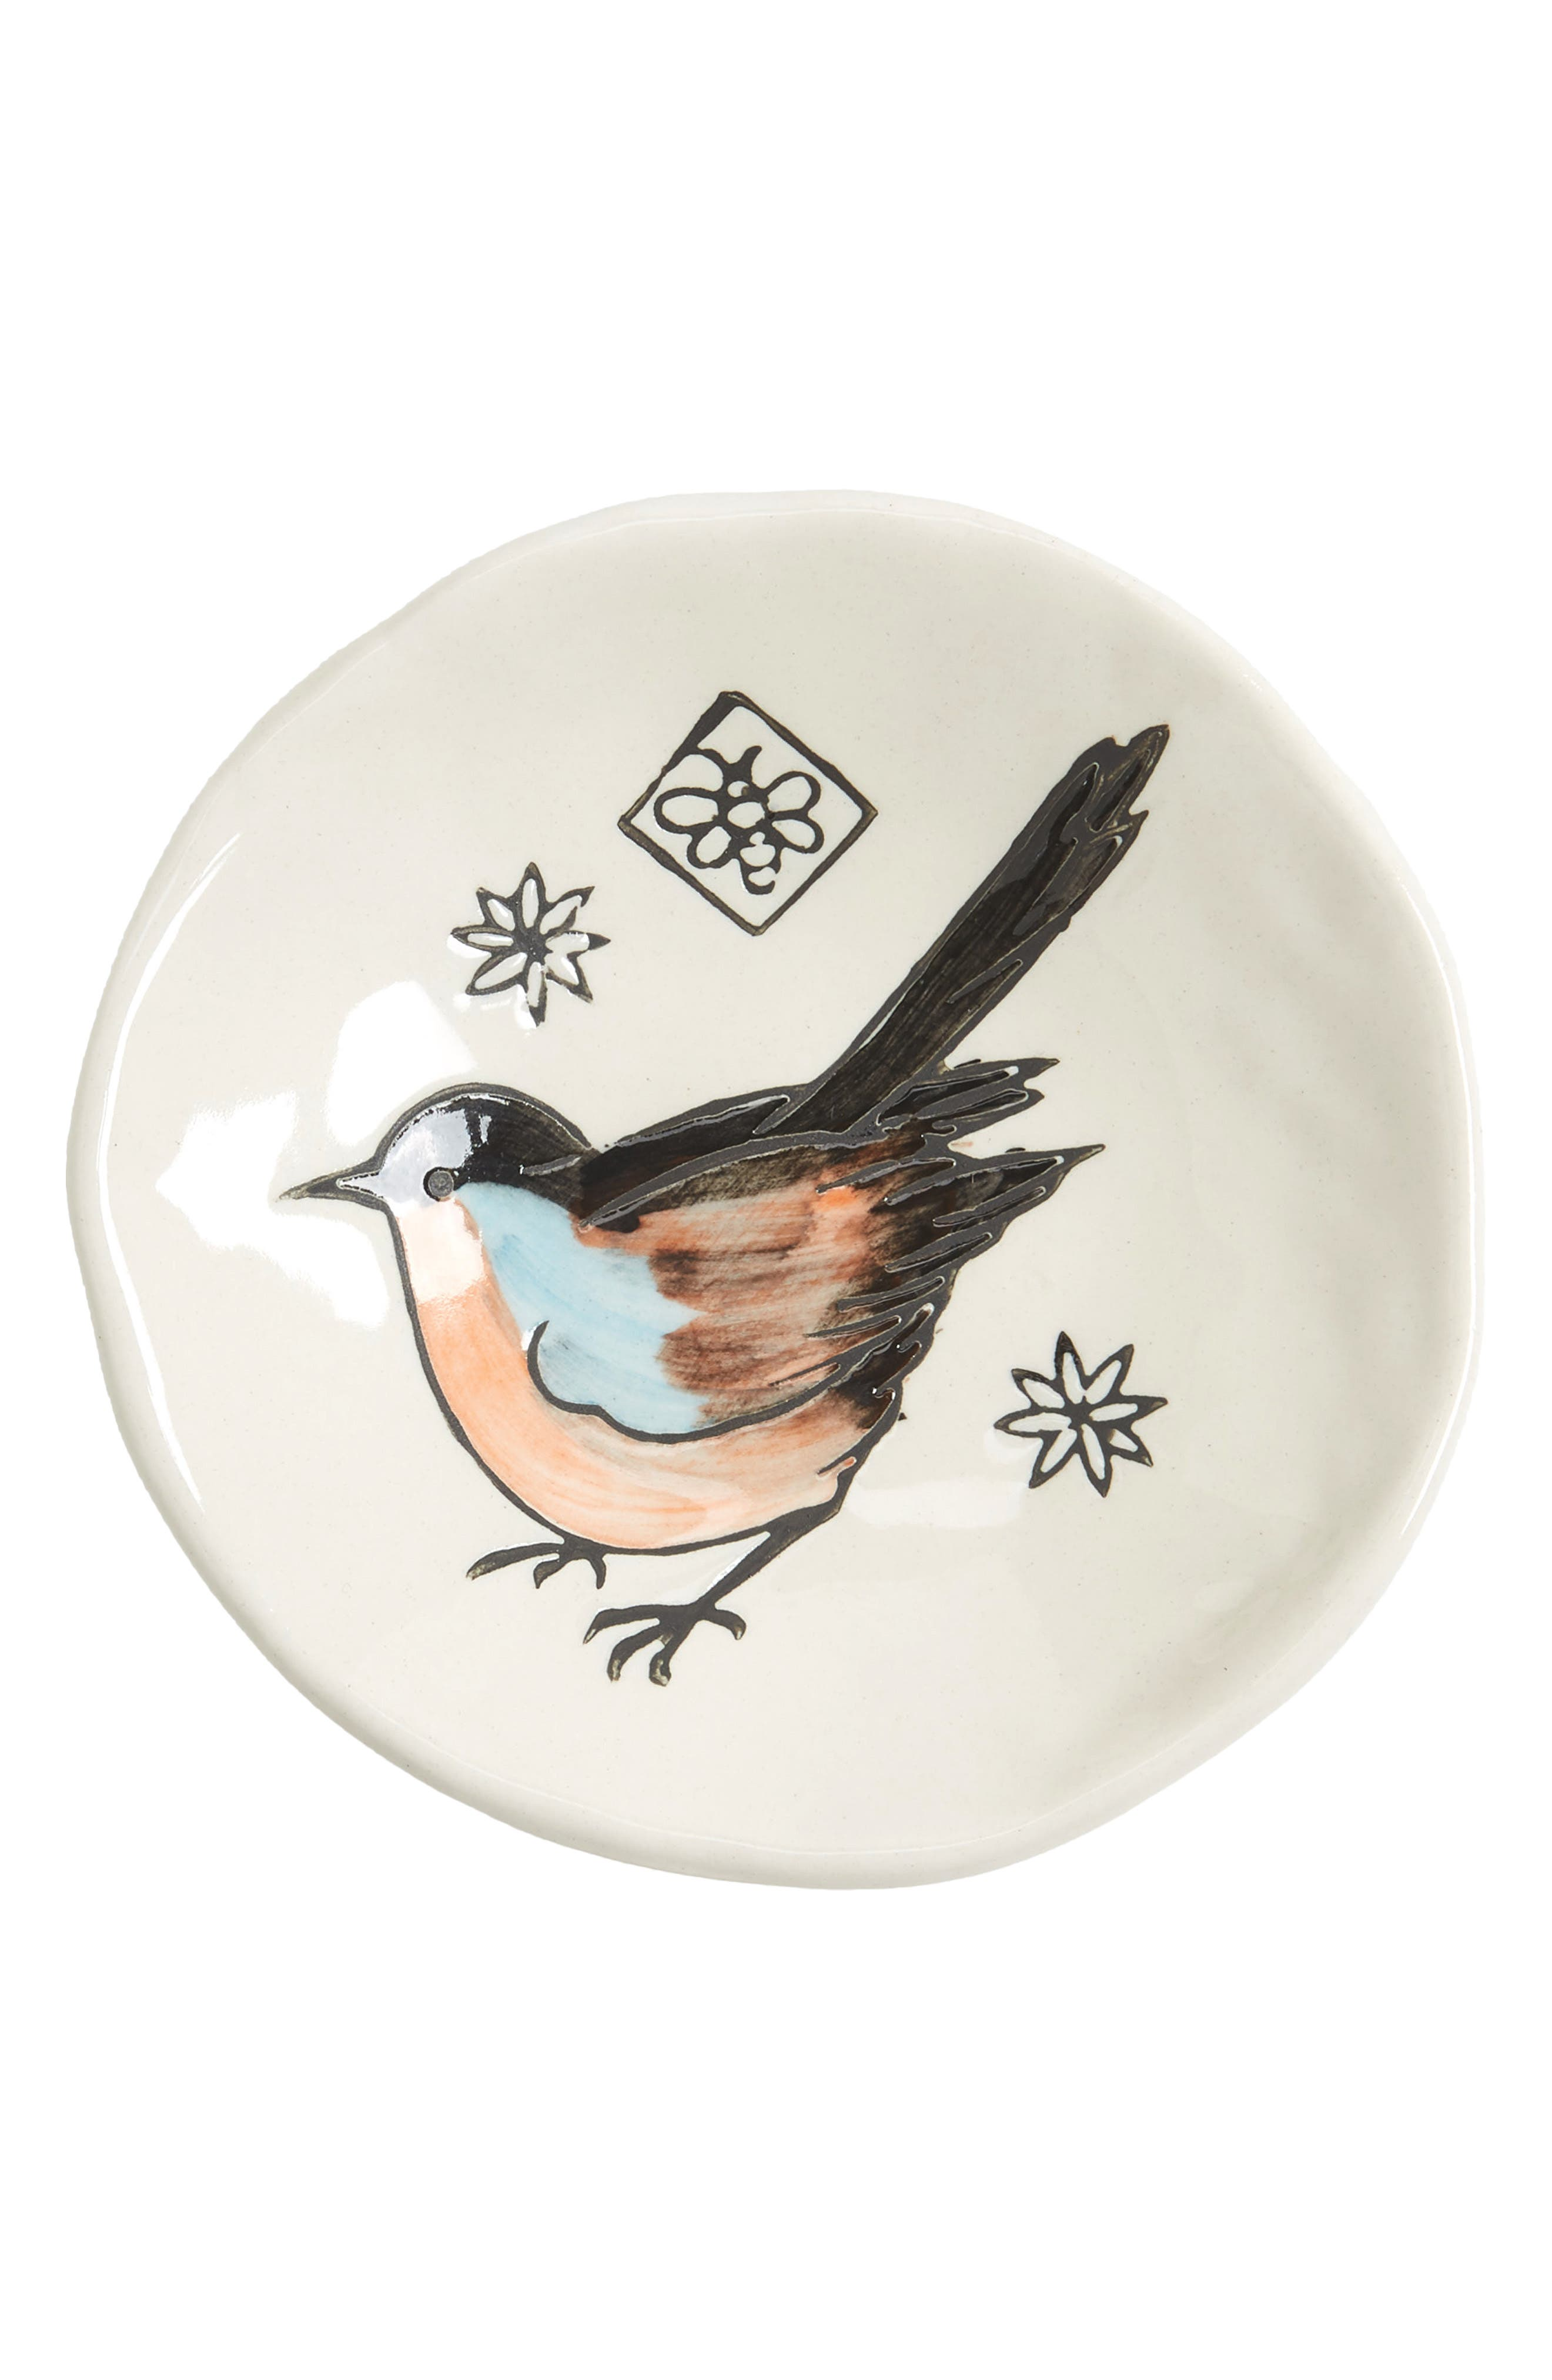 Small Bird Plate,                             Main thumbnail 1, color,                             White